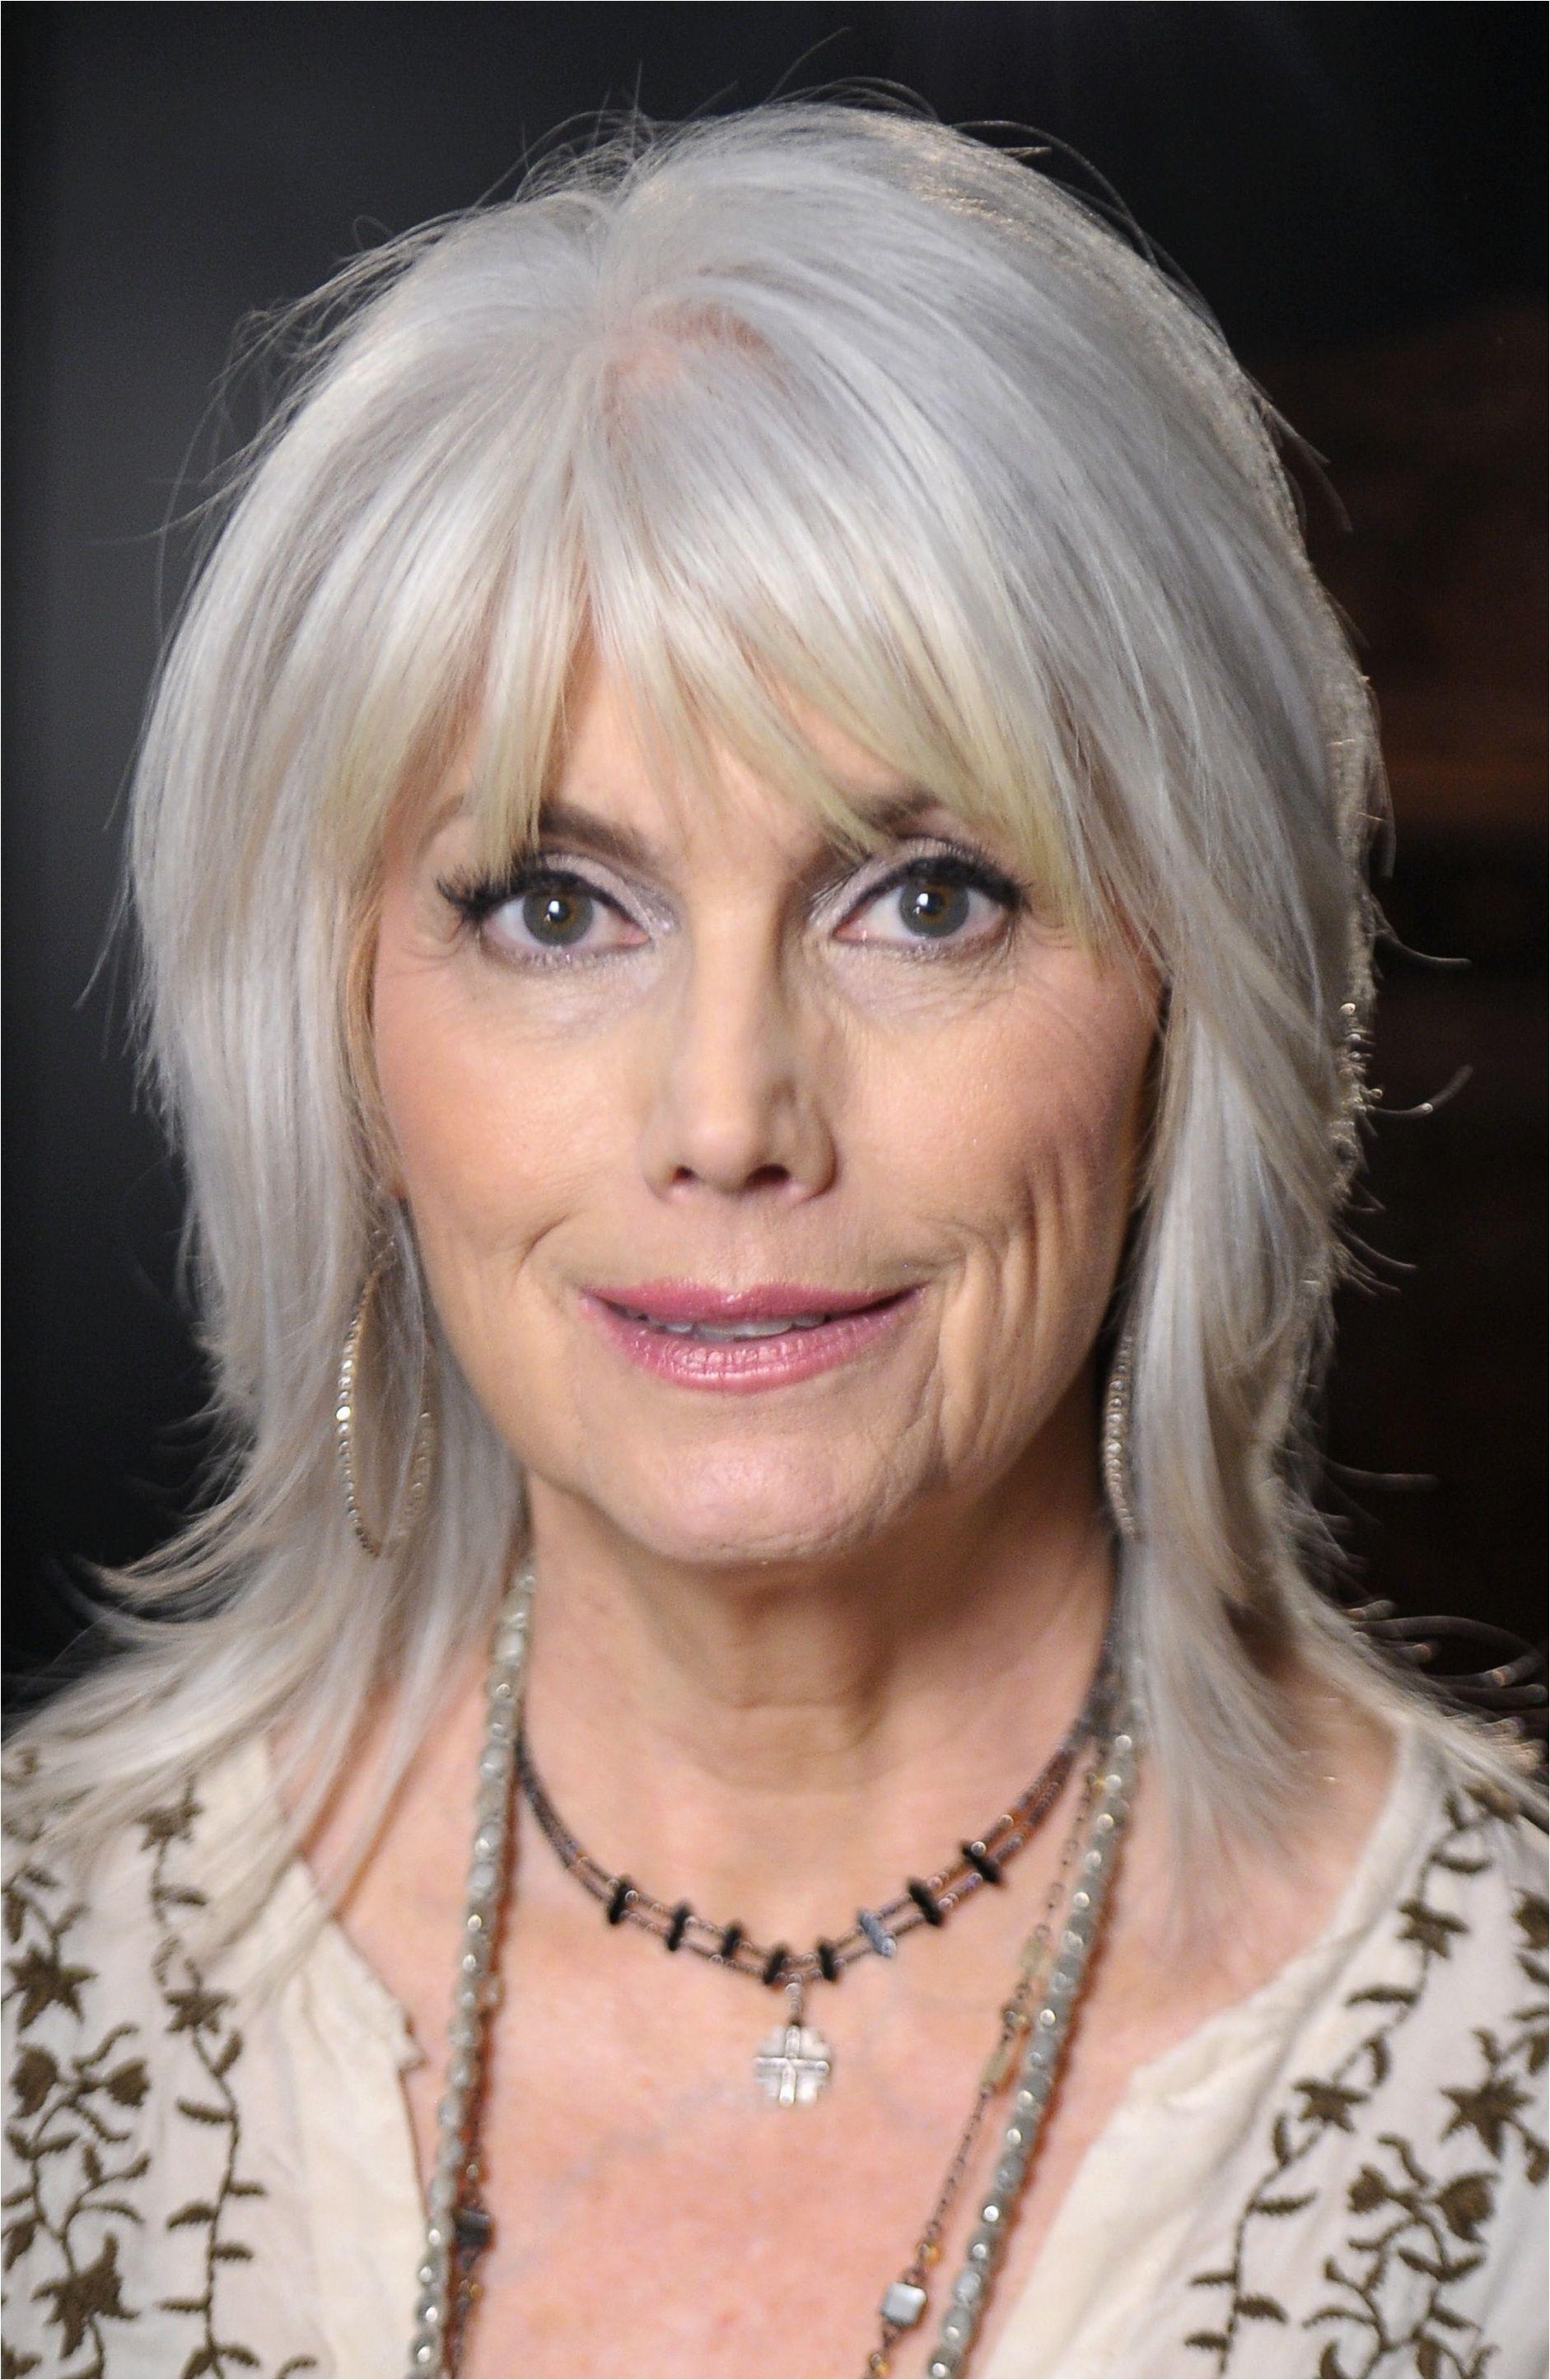 Medium Hair Styles Long Hair Styles Hair Medium Grey Hair Styles For Women